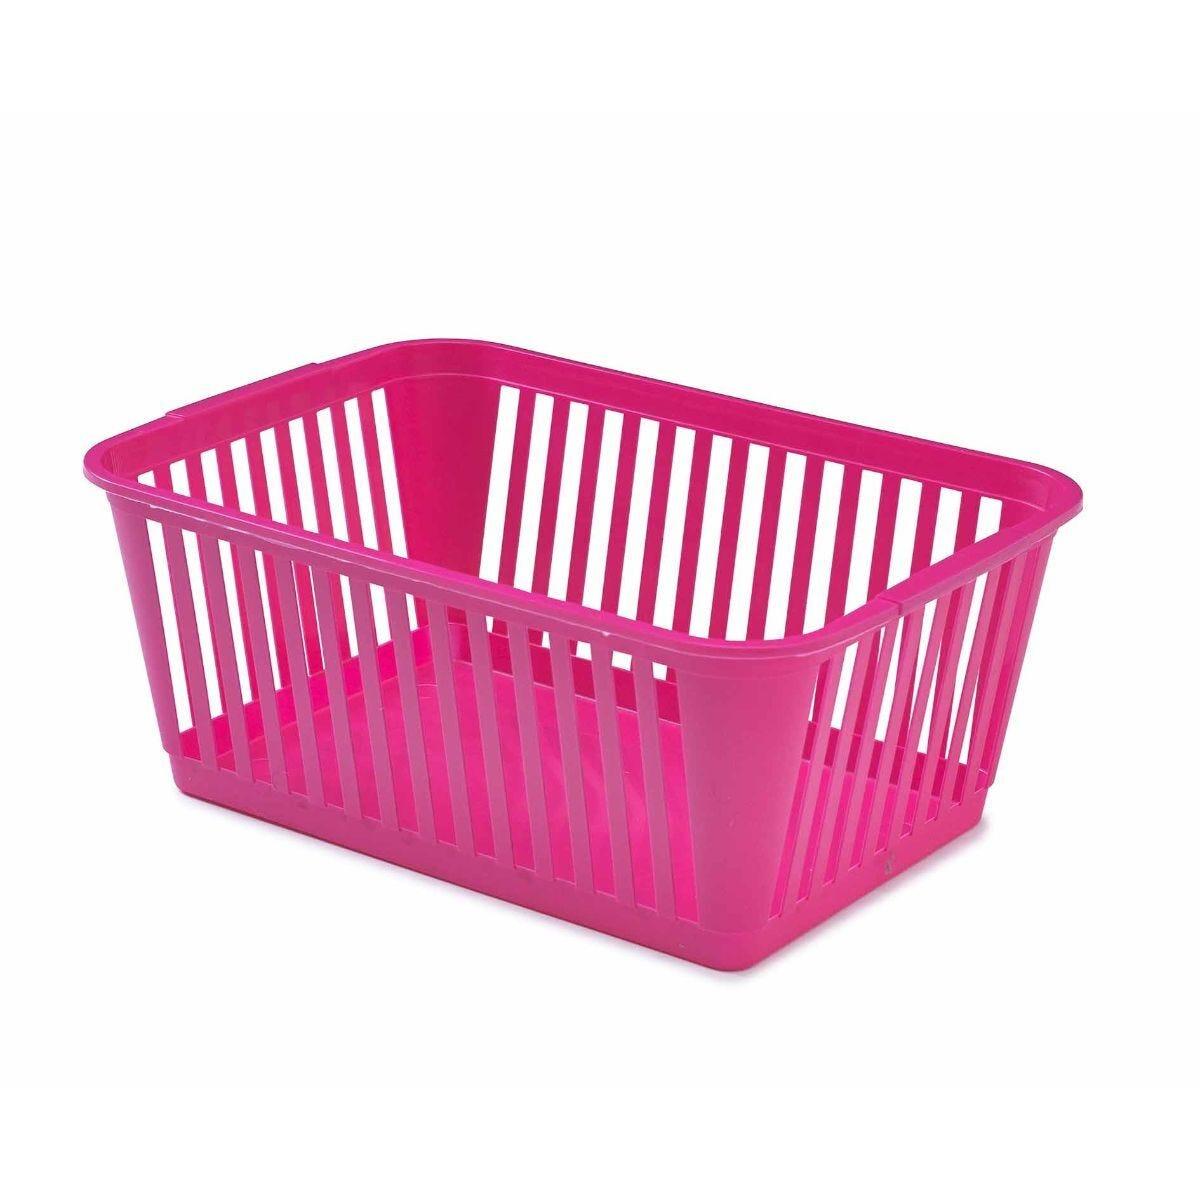 Whitefurze Handy Basket 37cm Pack of 3 Pink